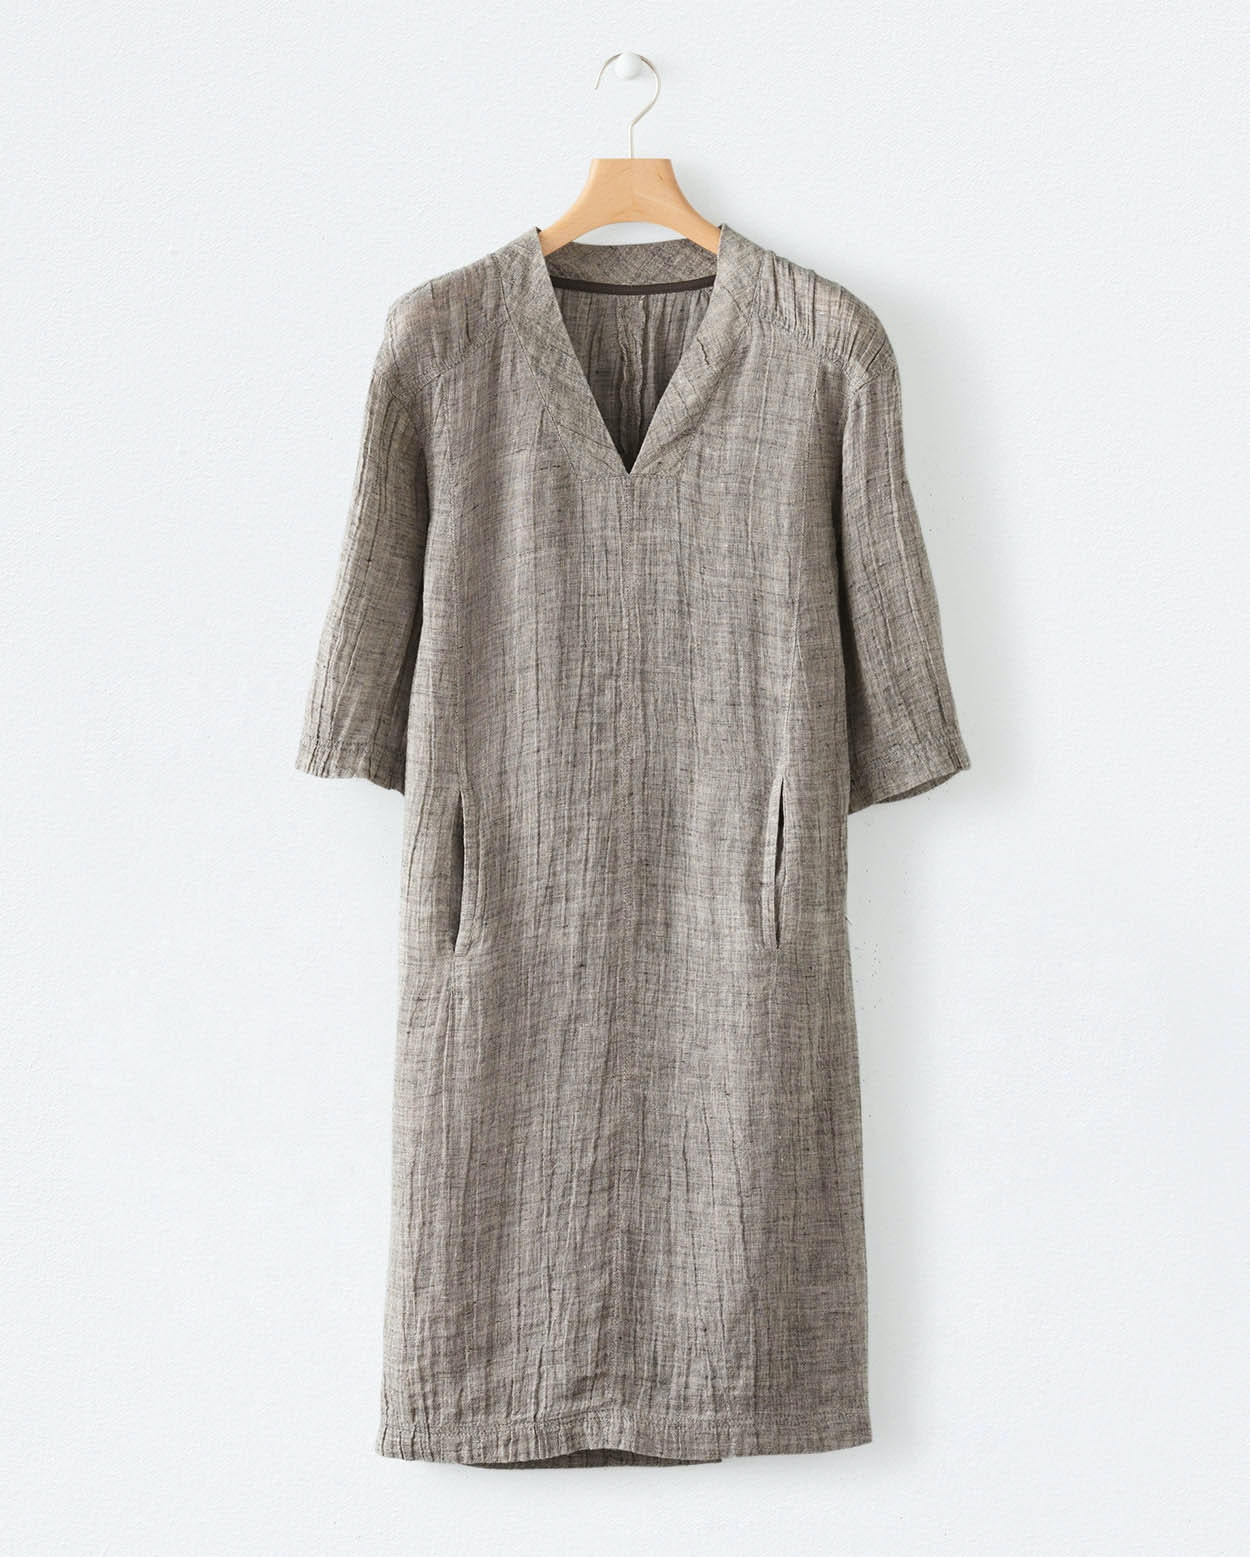 1676a97960 Poetry - Crinkle linen v-neck dress